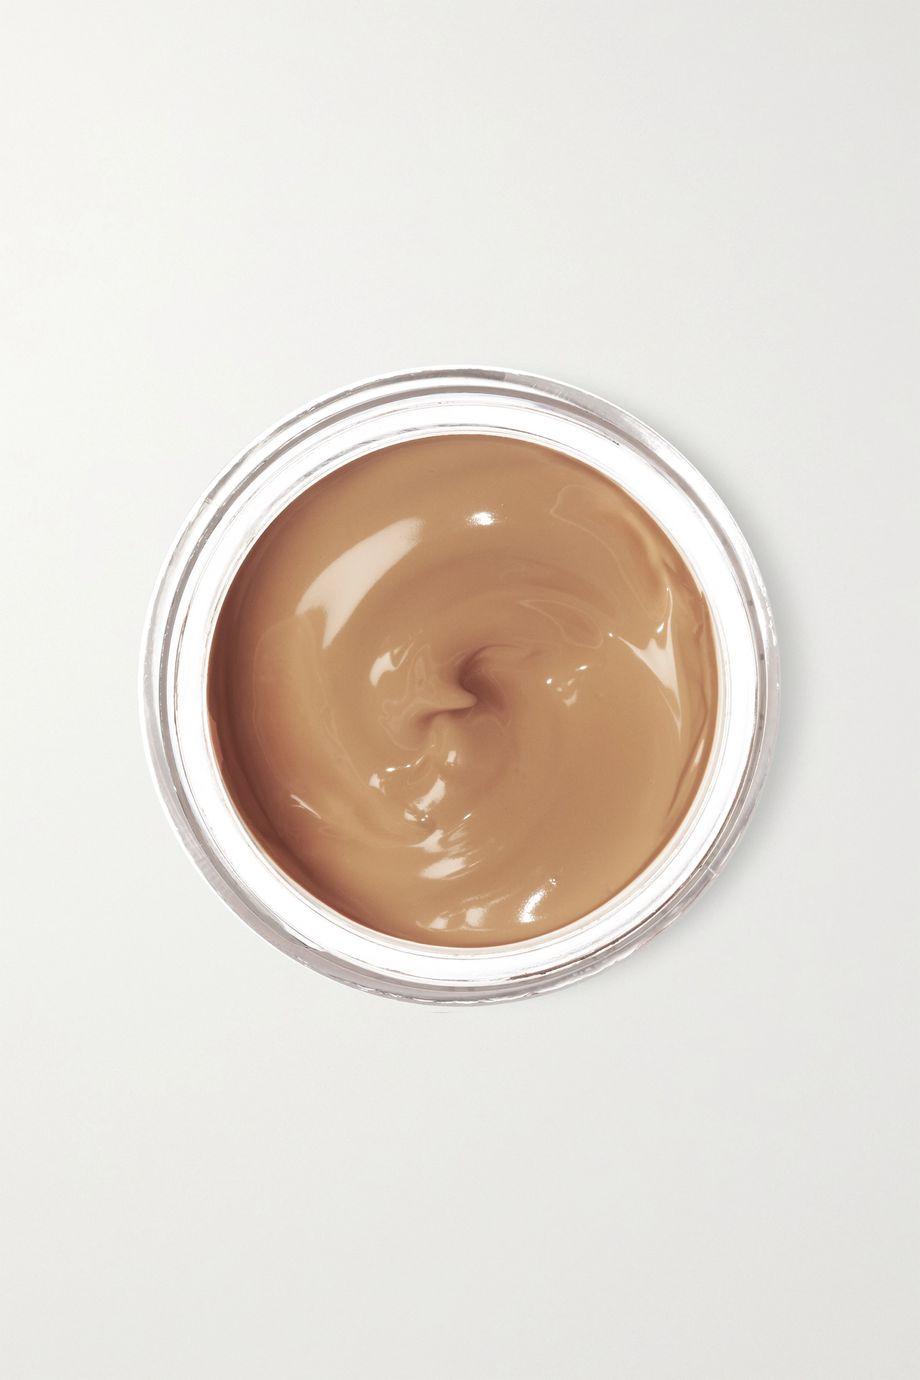 Chantecaille Future Skin Oil Free Gel Foundation - Hazel, 30g